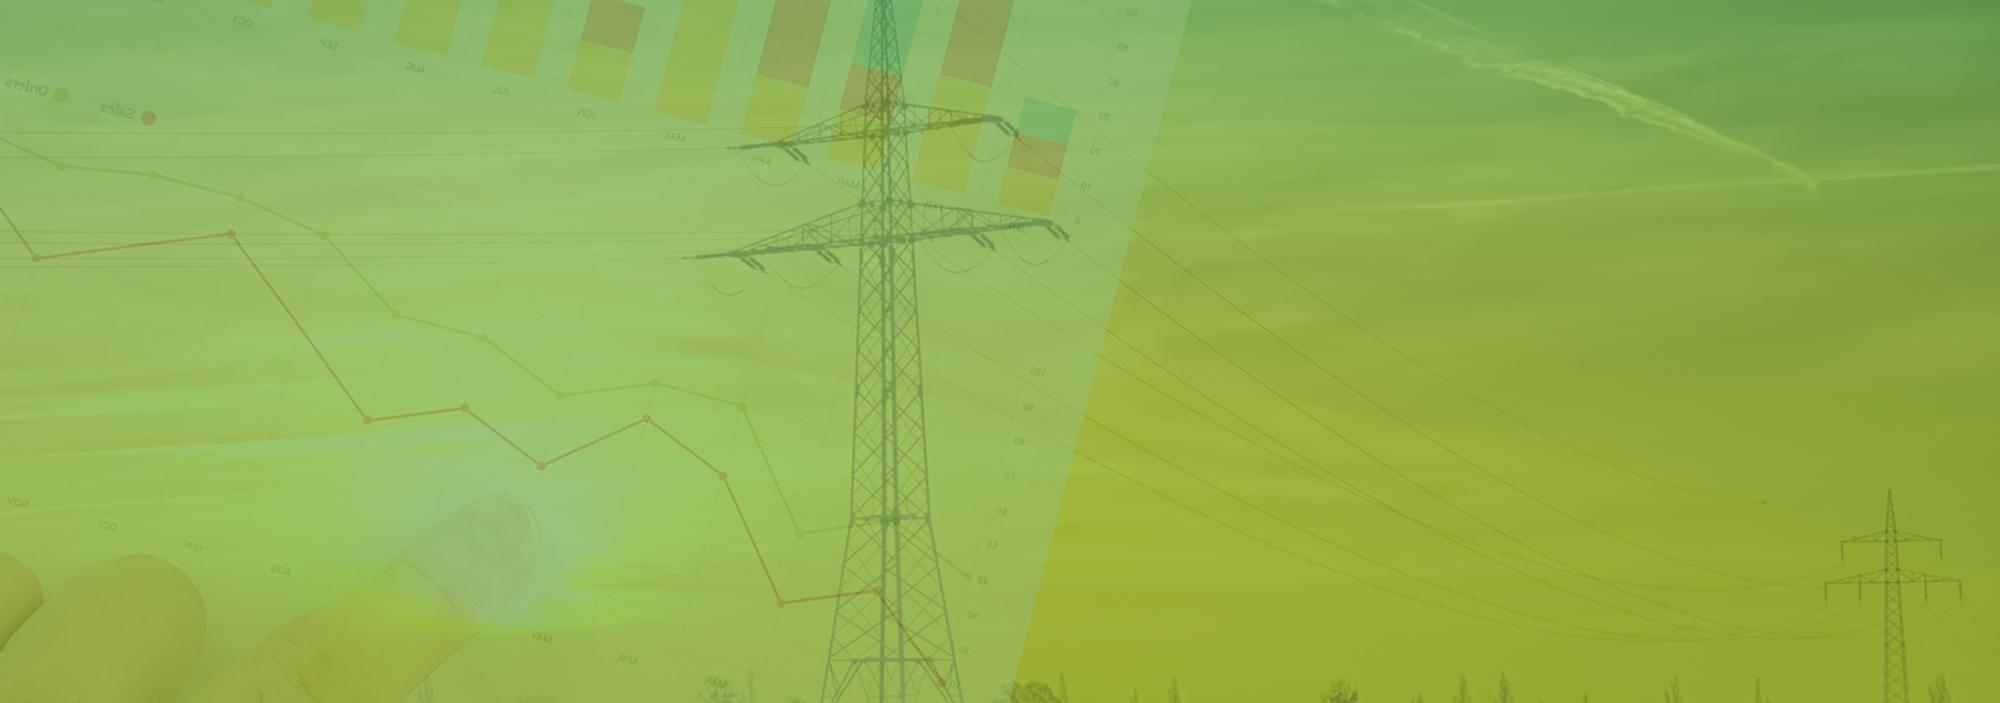 Stijging van energietarieven - Veba Energieservice B.V.